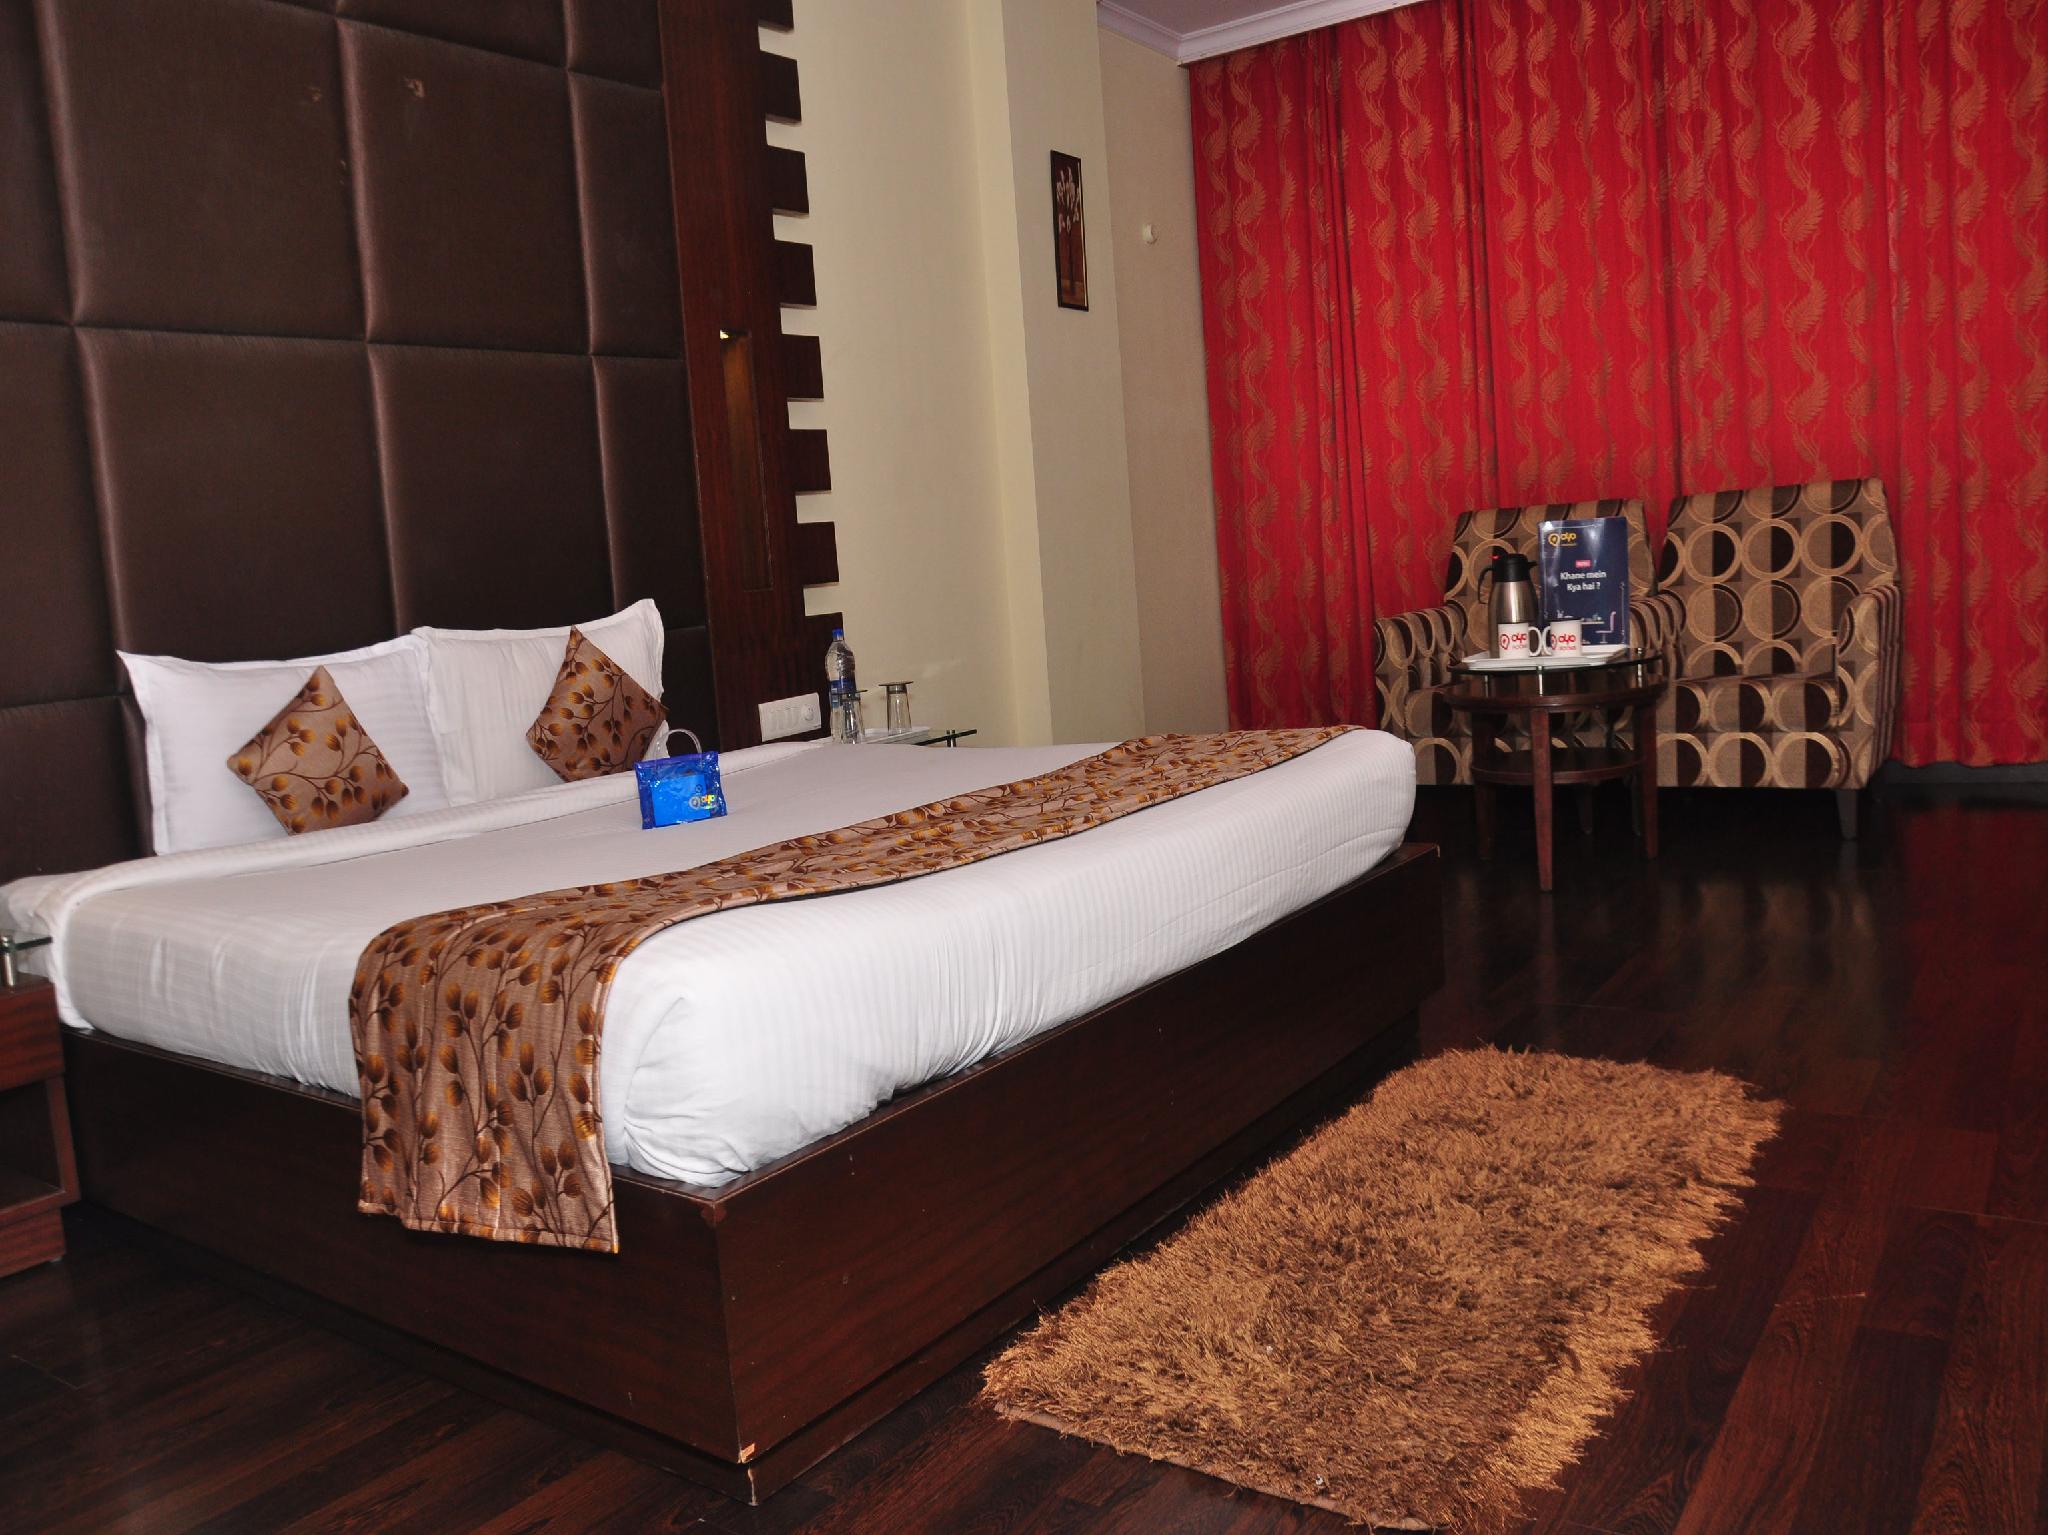 Discount OYO Premium ISBT Tutikandi Shimla